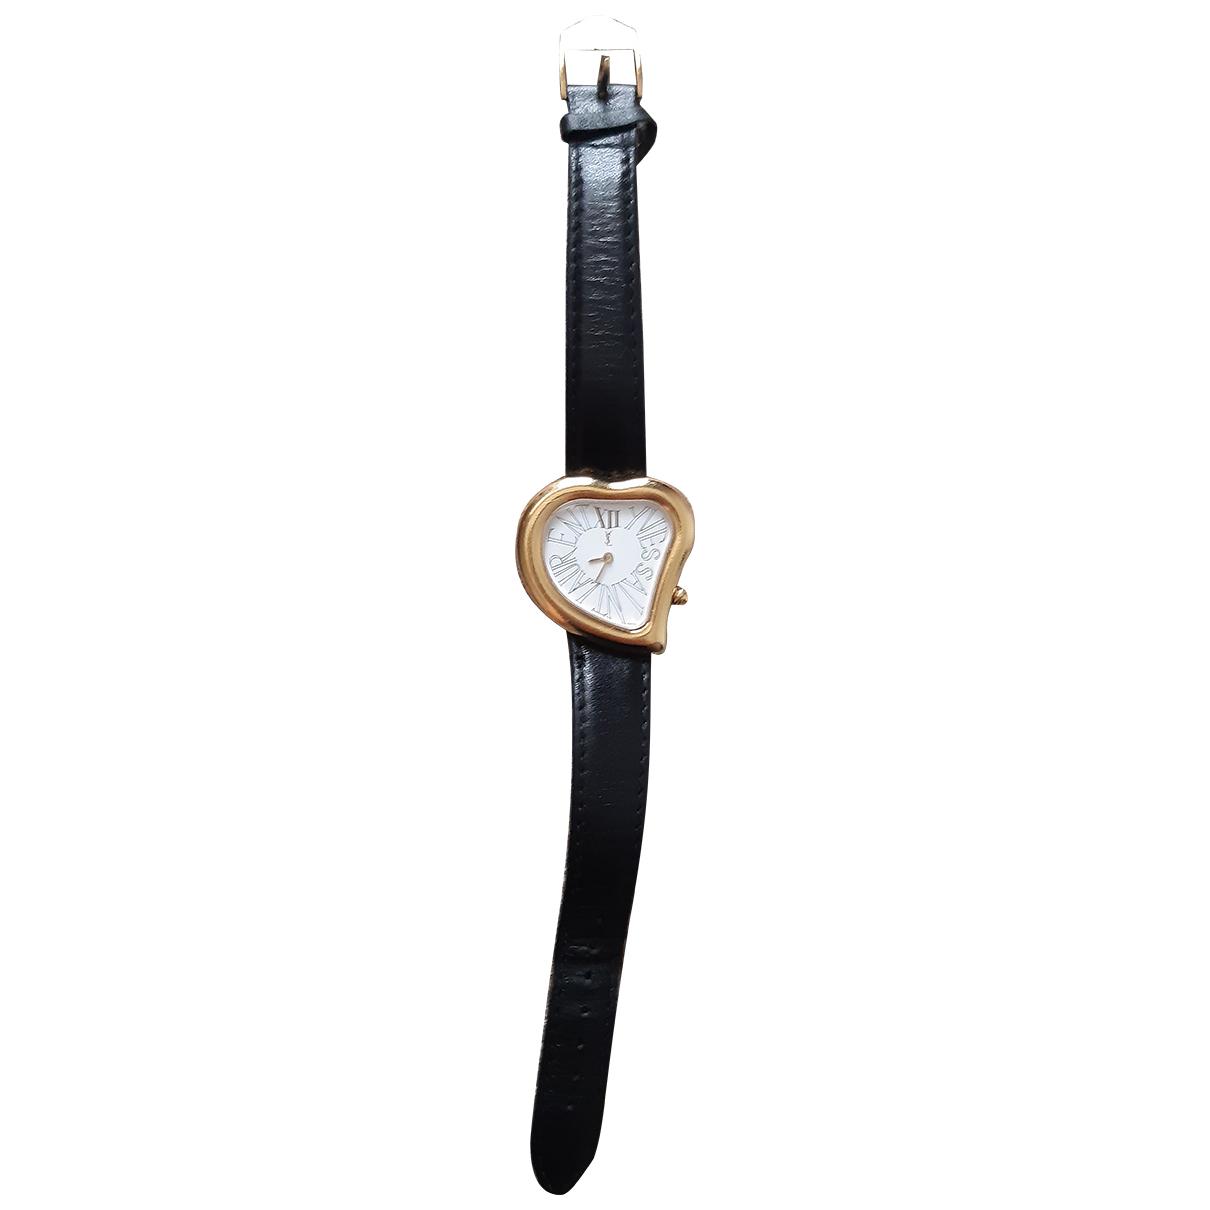 Yves Saint Laurent \N Uhr in  Schwarz Stahl